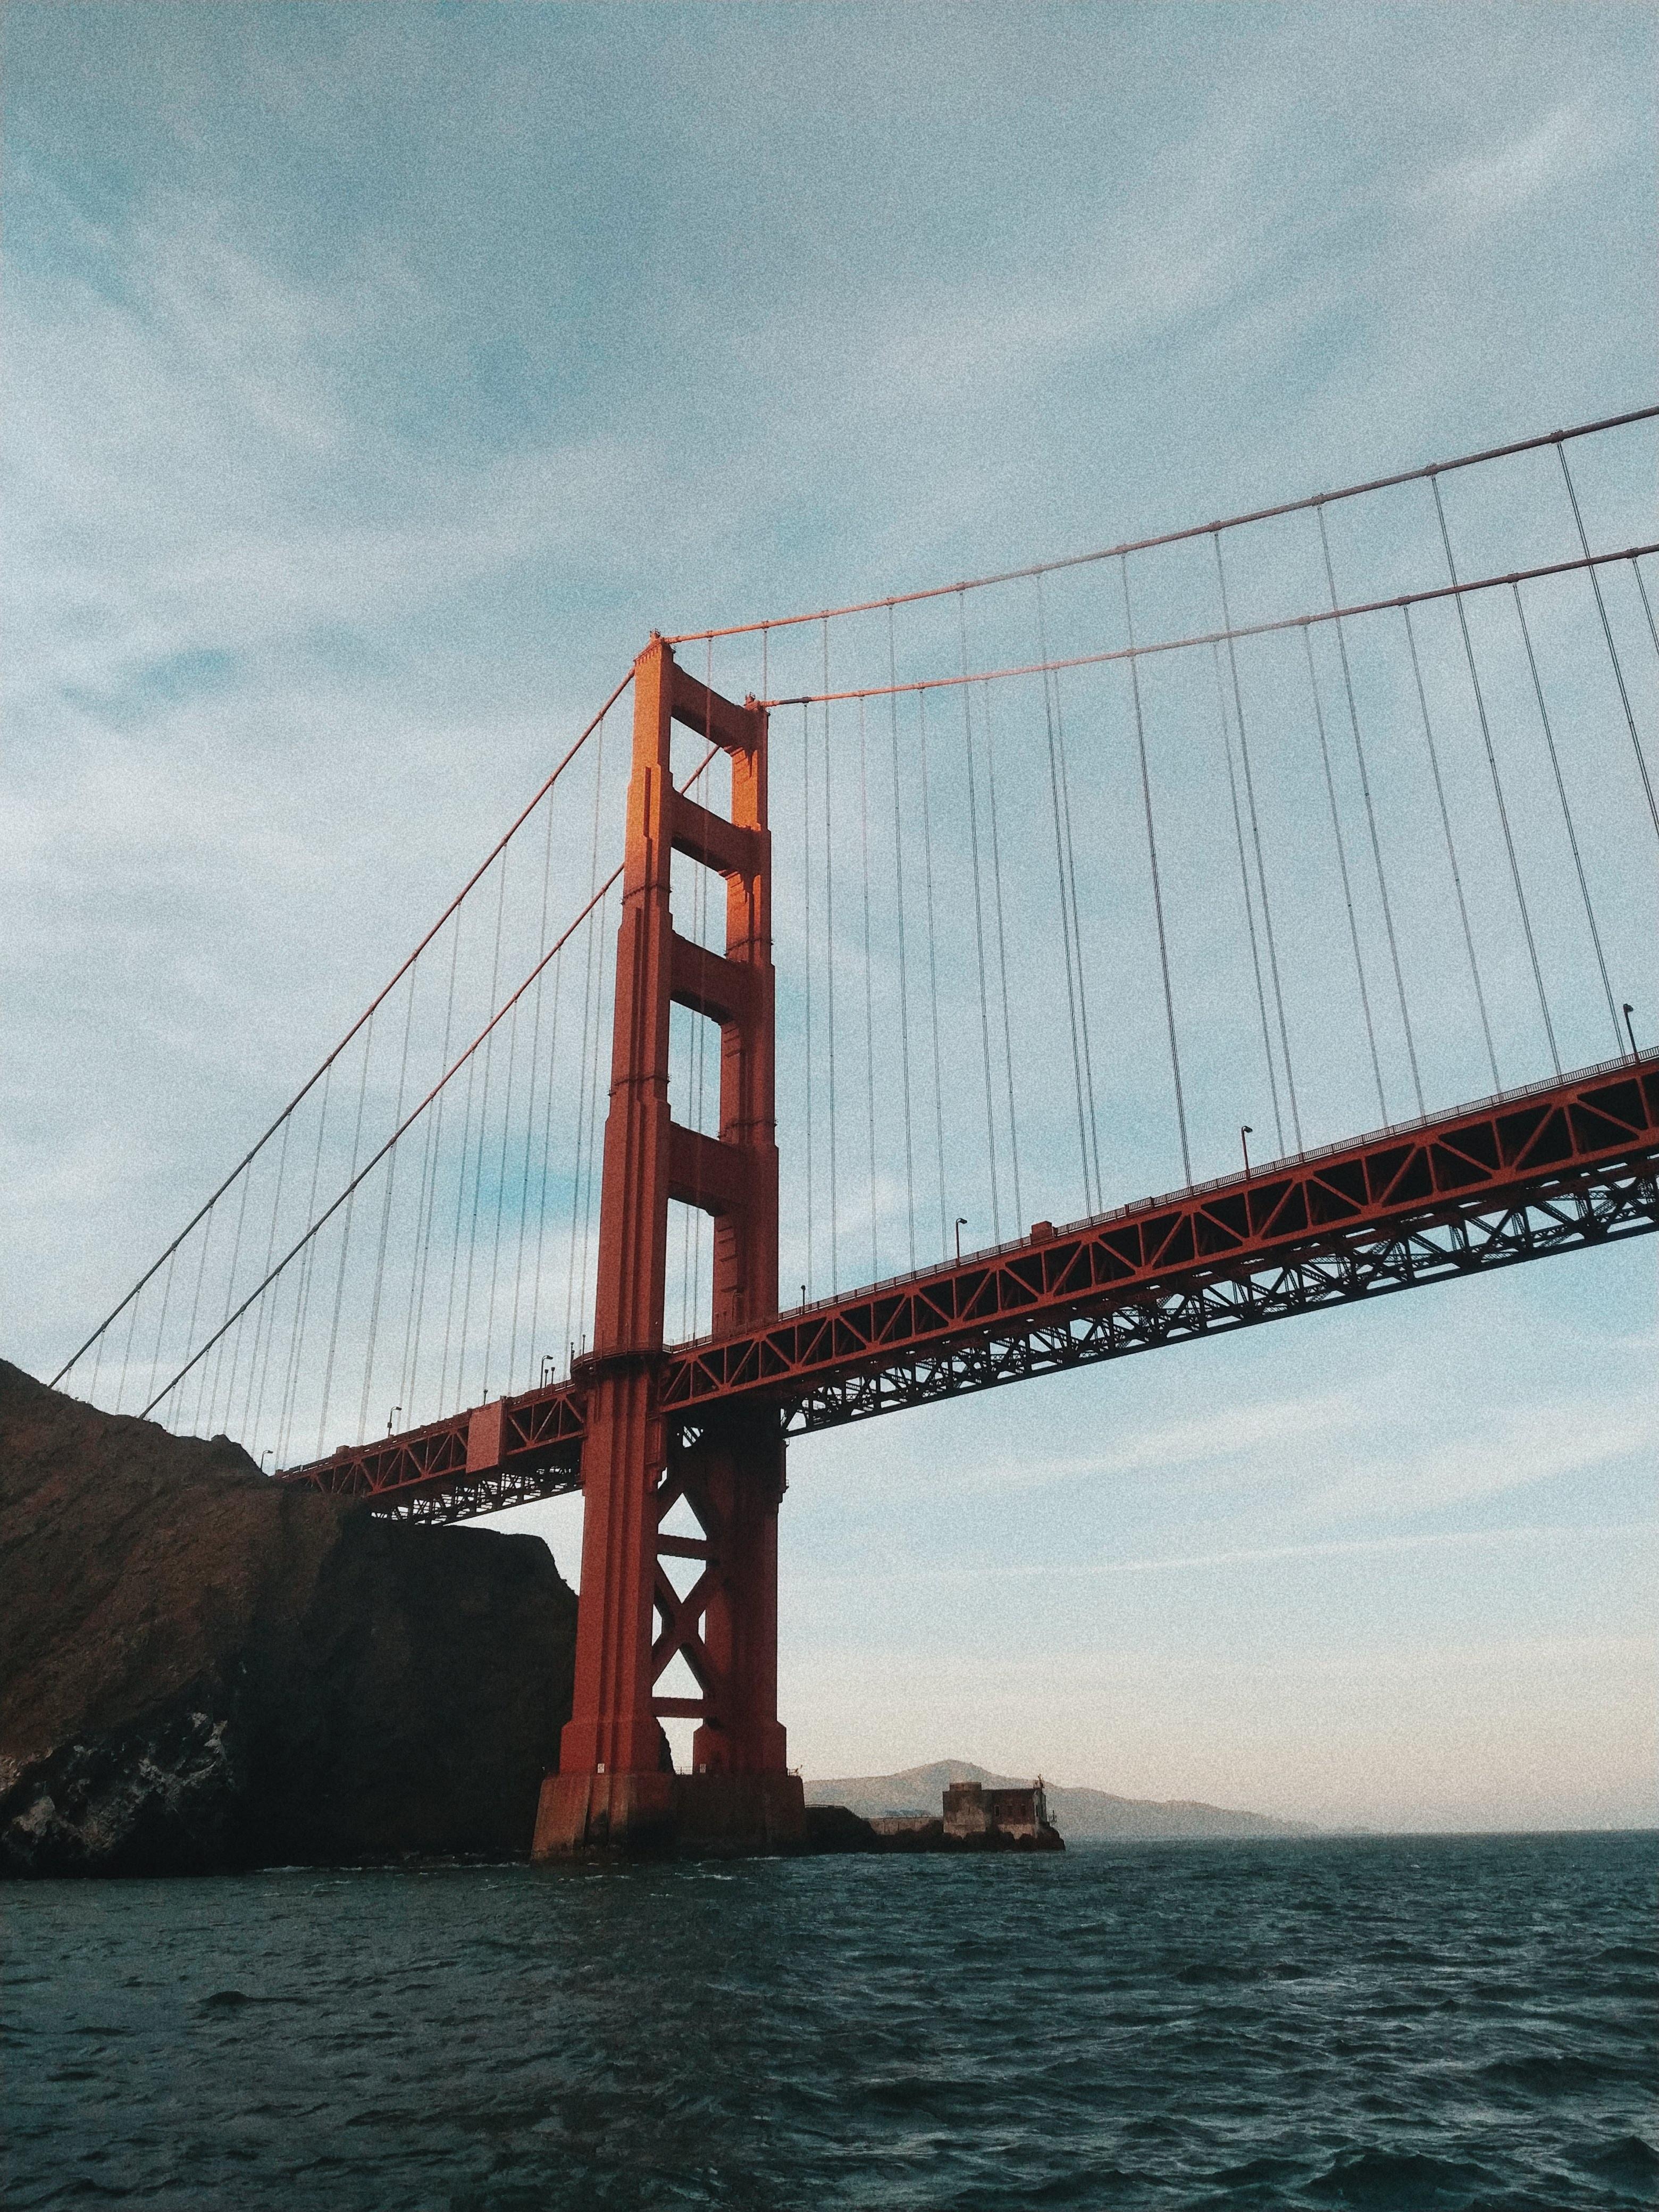 Golden Gate Bridge under blue sky